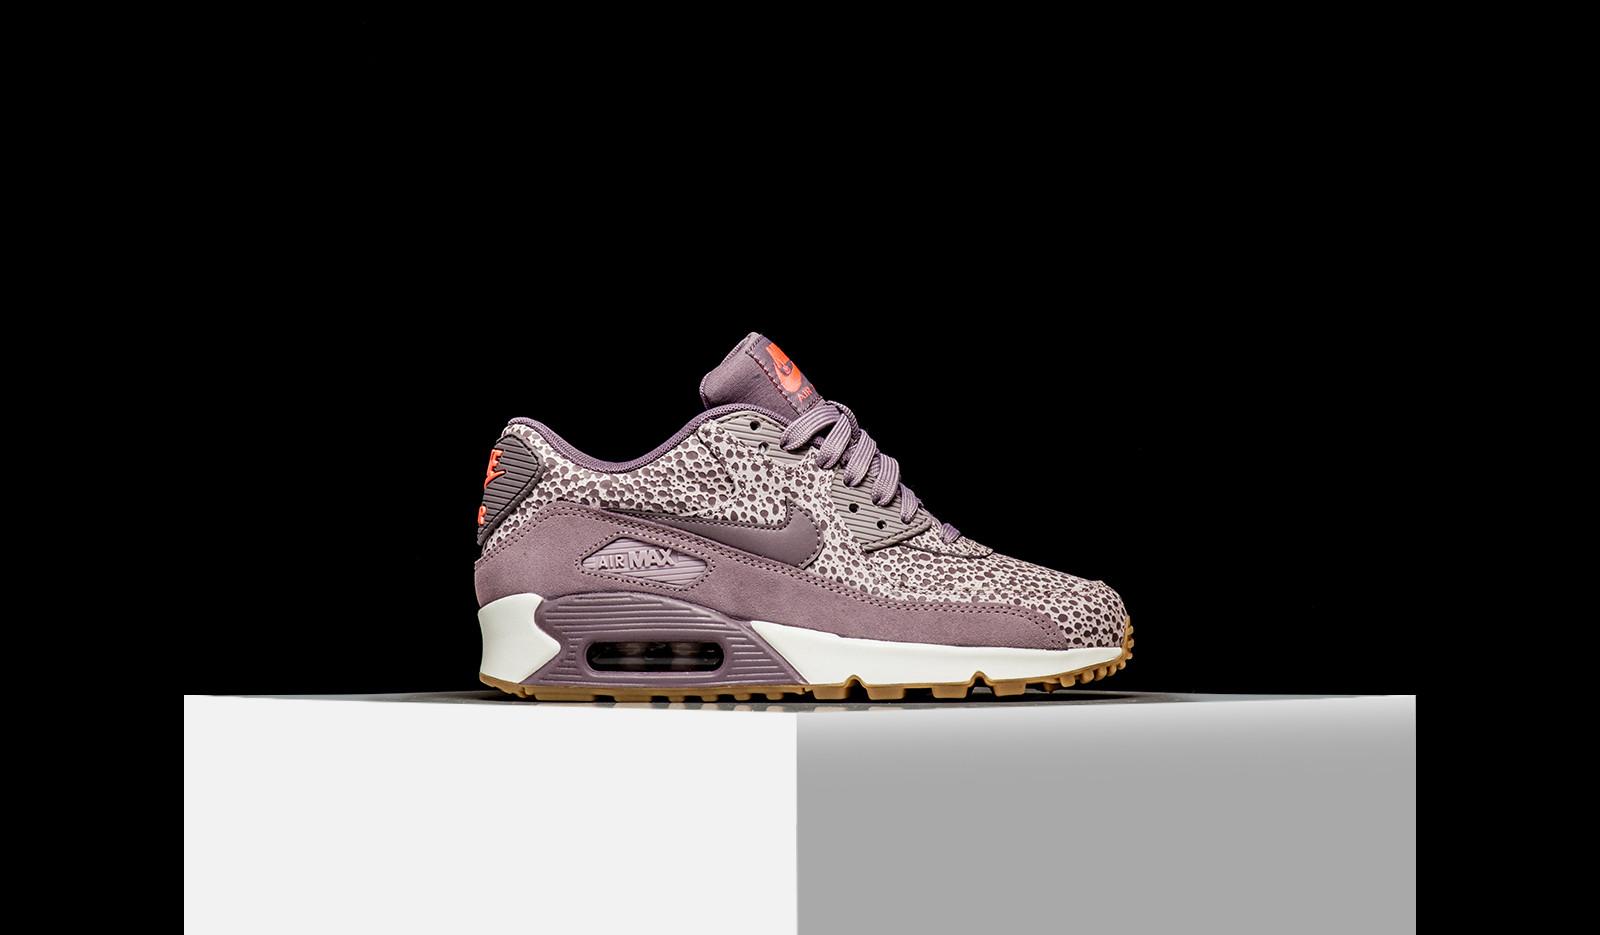 Nike Air Max 90 PRM Premium Safari Black White 443817 006 Mens Womens Running Shoes 443817 006